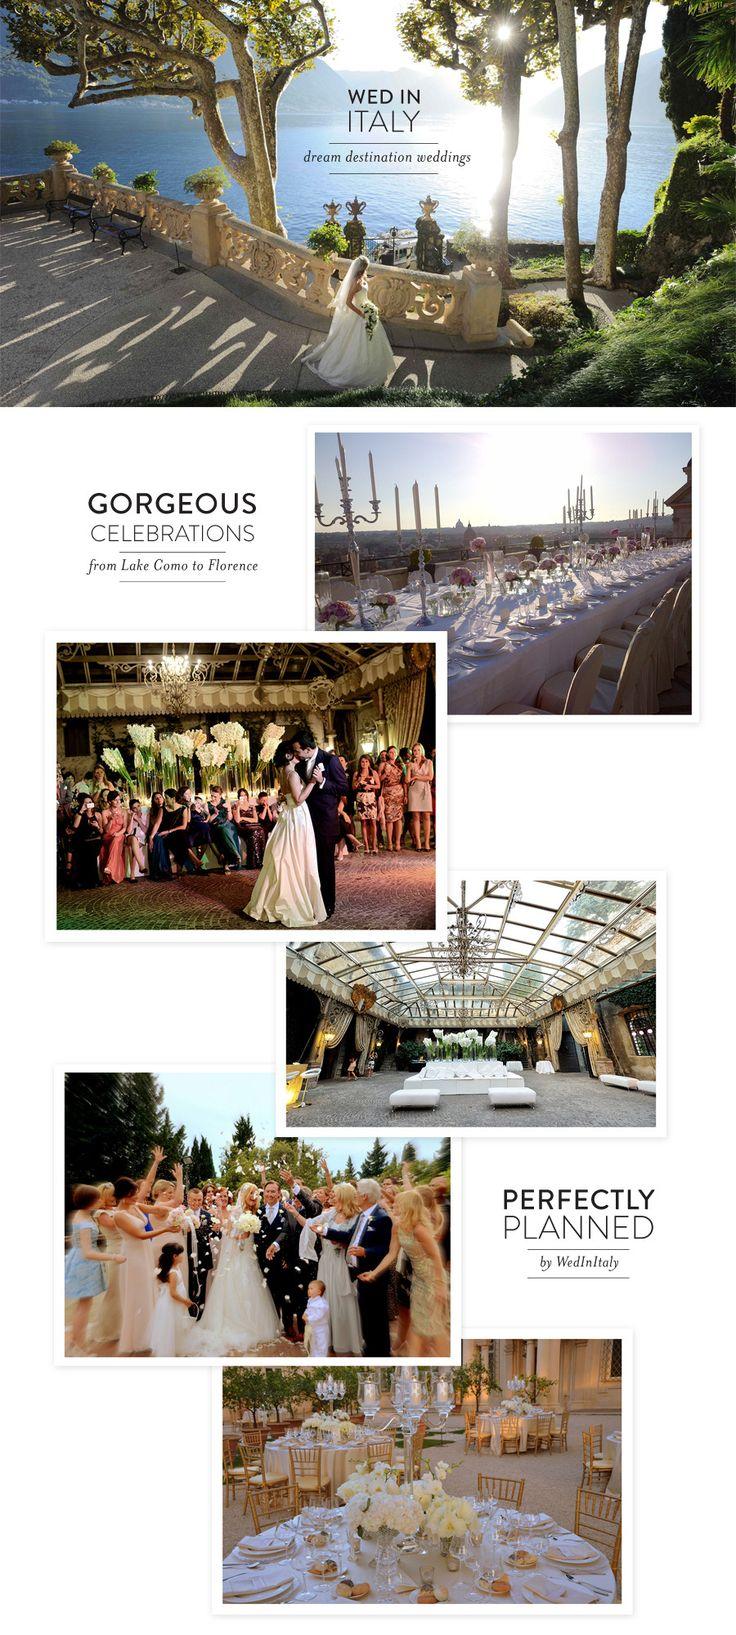 Italian Destination Weddings by WedInItaly  Read more - http://www.stylemepretty.com/destination-weddings/2013/12/12/italian-destination-weddings-by-wedinitaly/